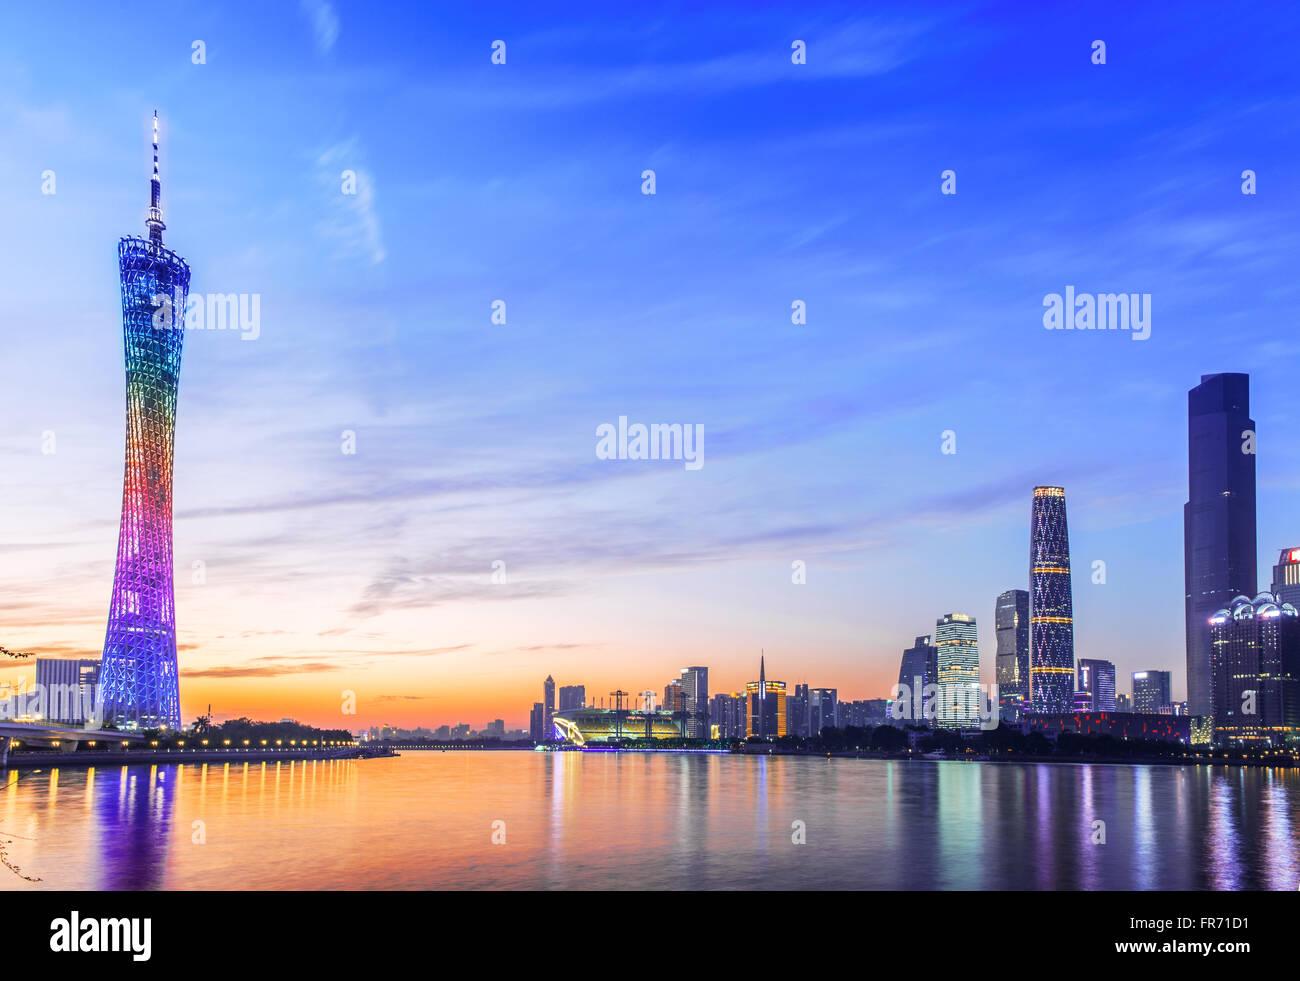 Guangzhou city scene - Stock Image